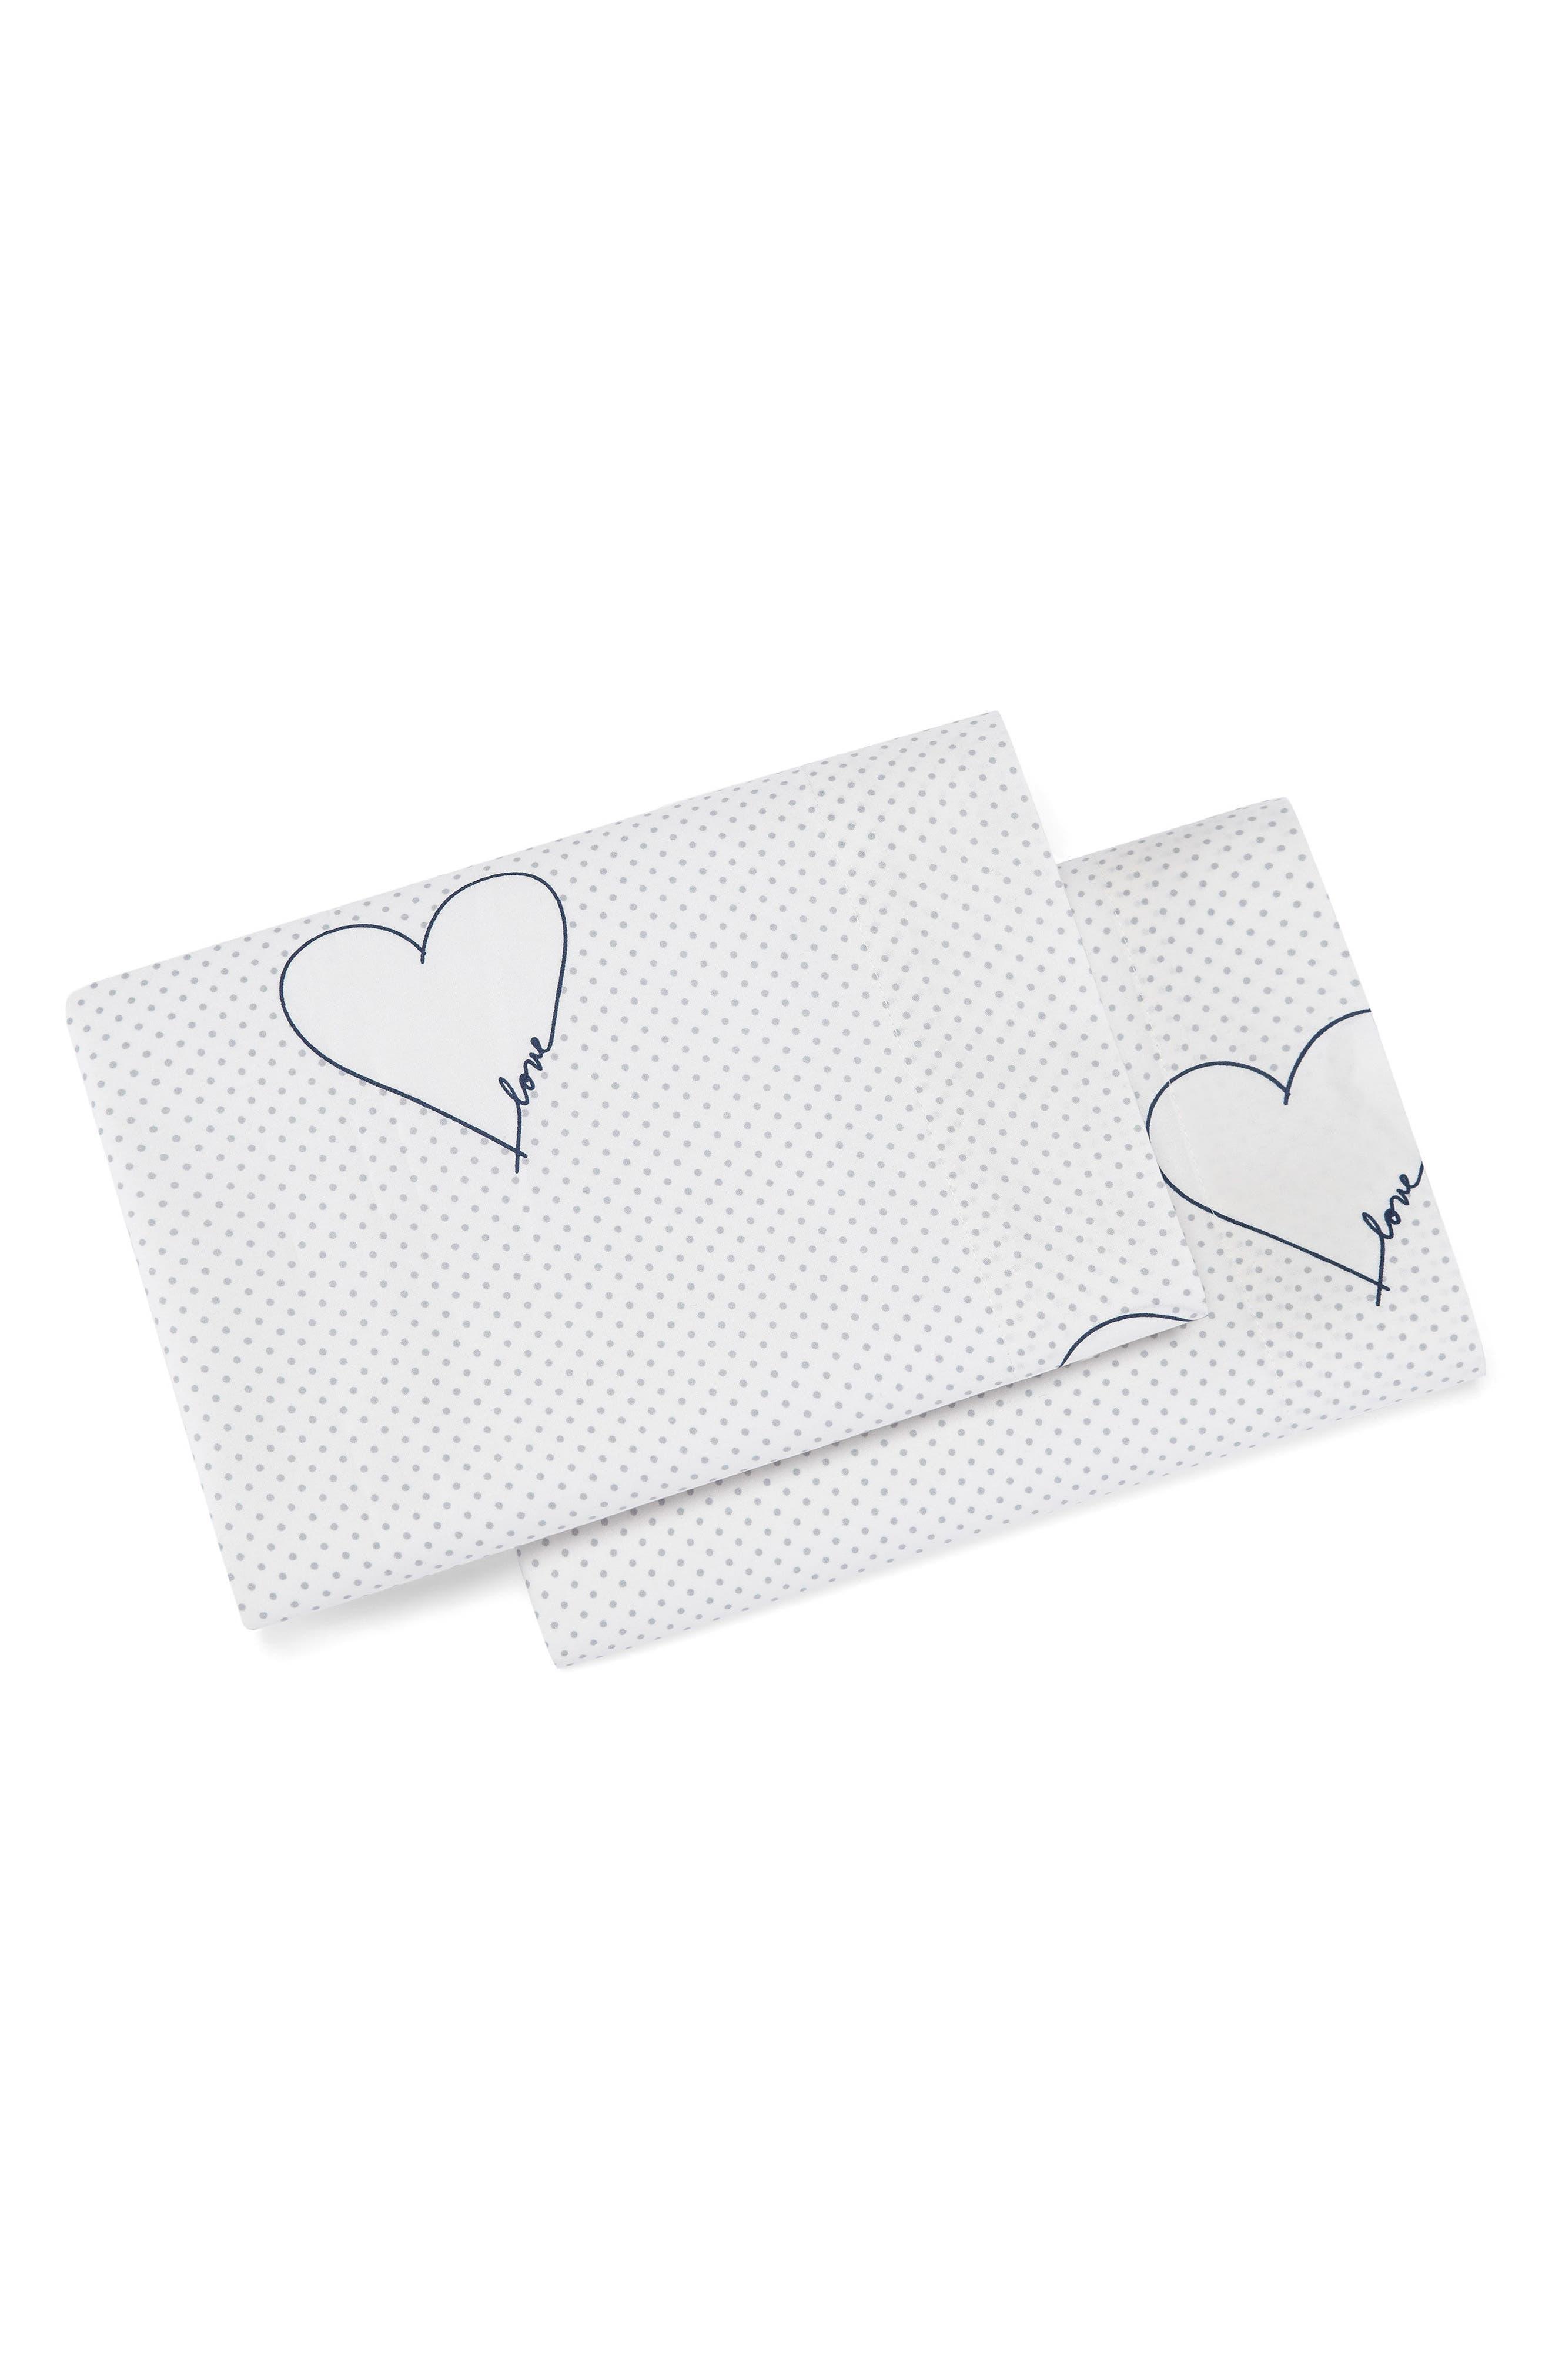 Love Hearts Pillowcases,                             Main thumbnail 1, color,                             DARK BLUE